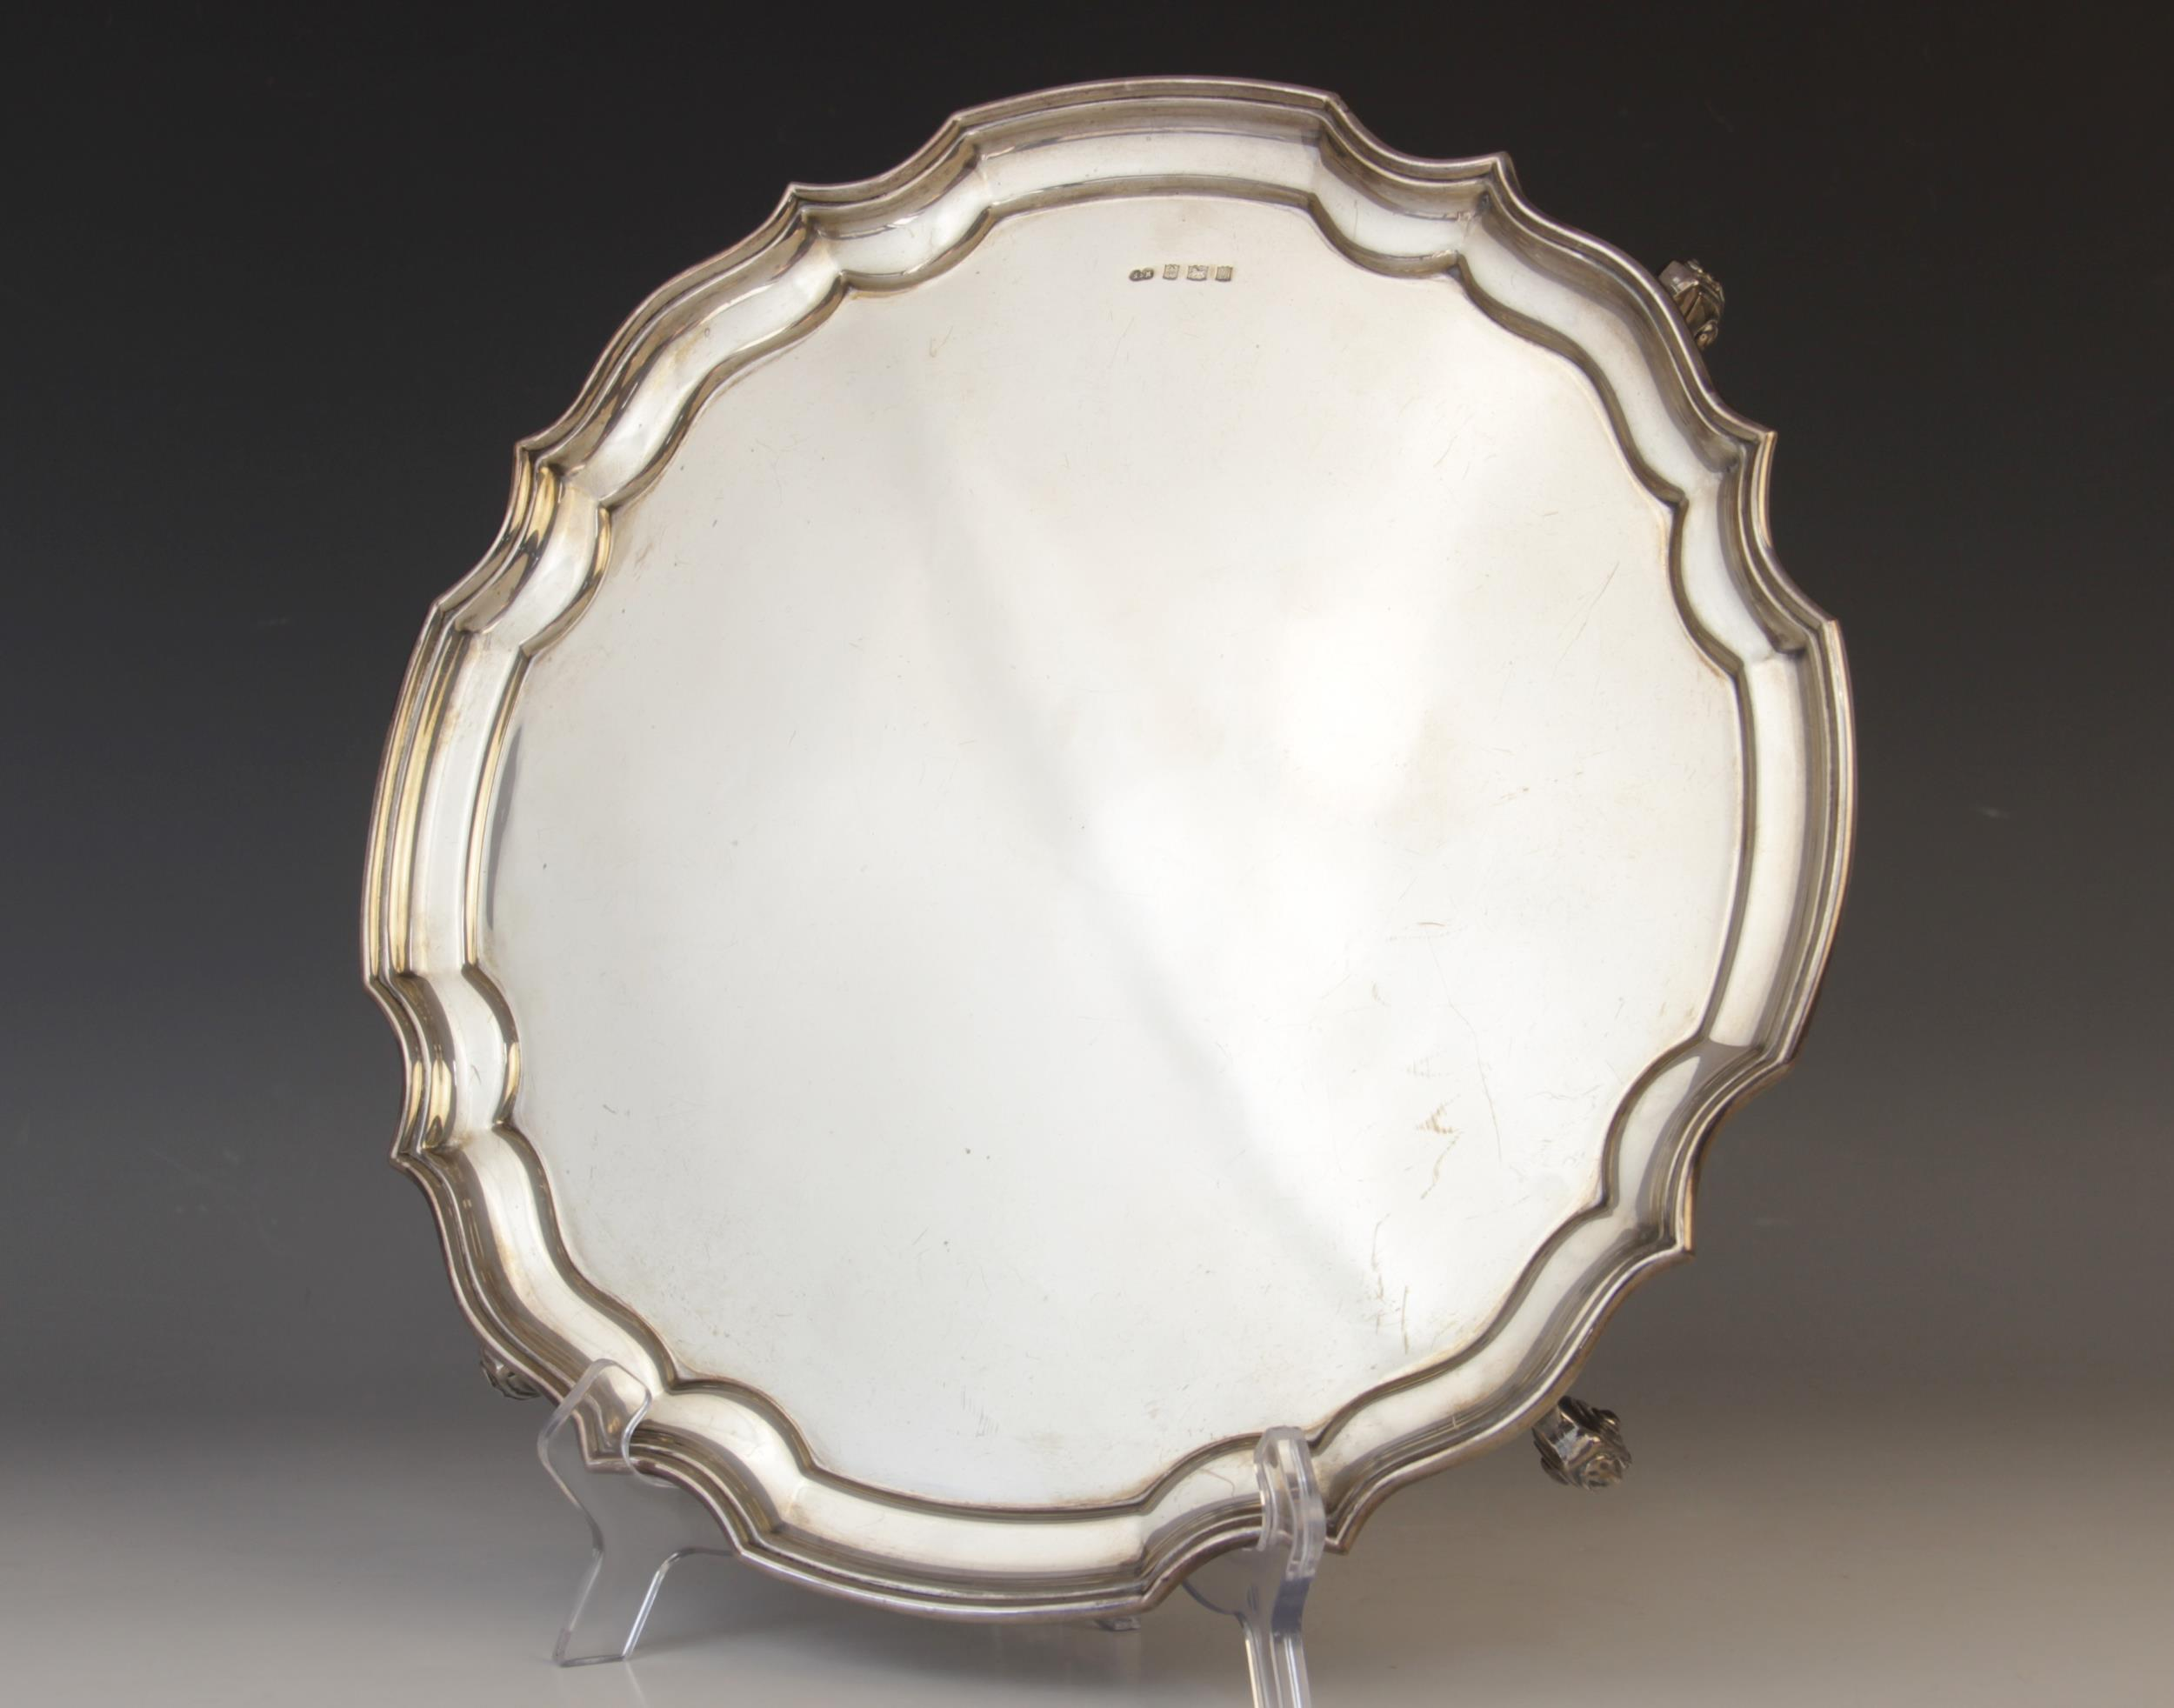 A silver salver by Sanders & McKenzie, Birmingham 1969, of circular form with pie-crust border on